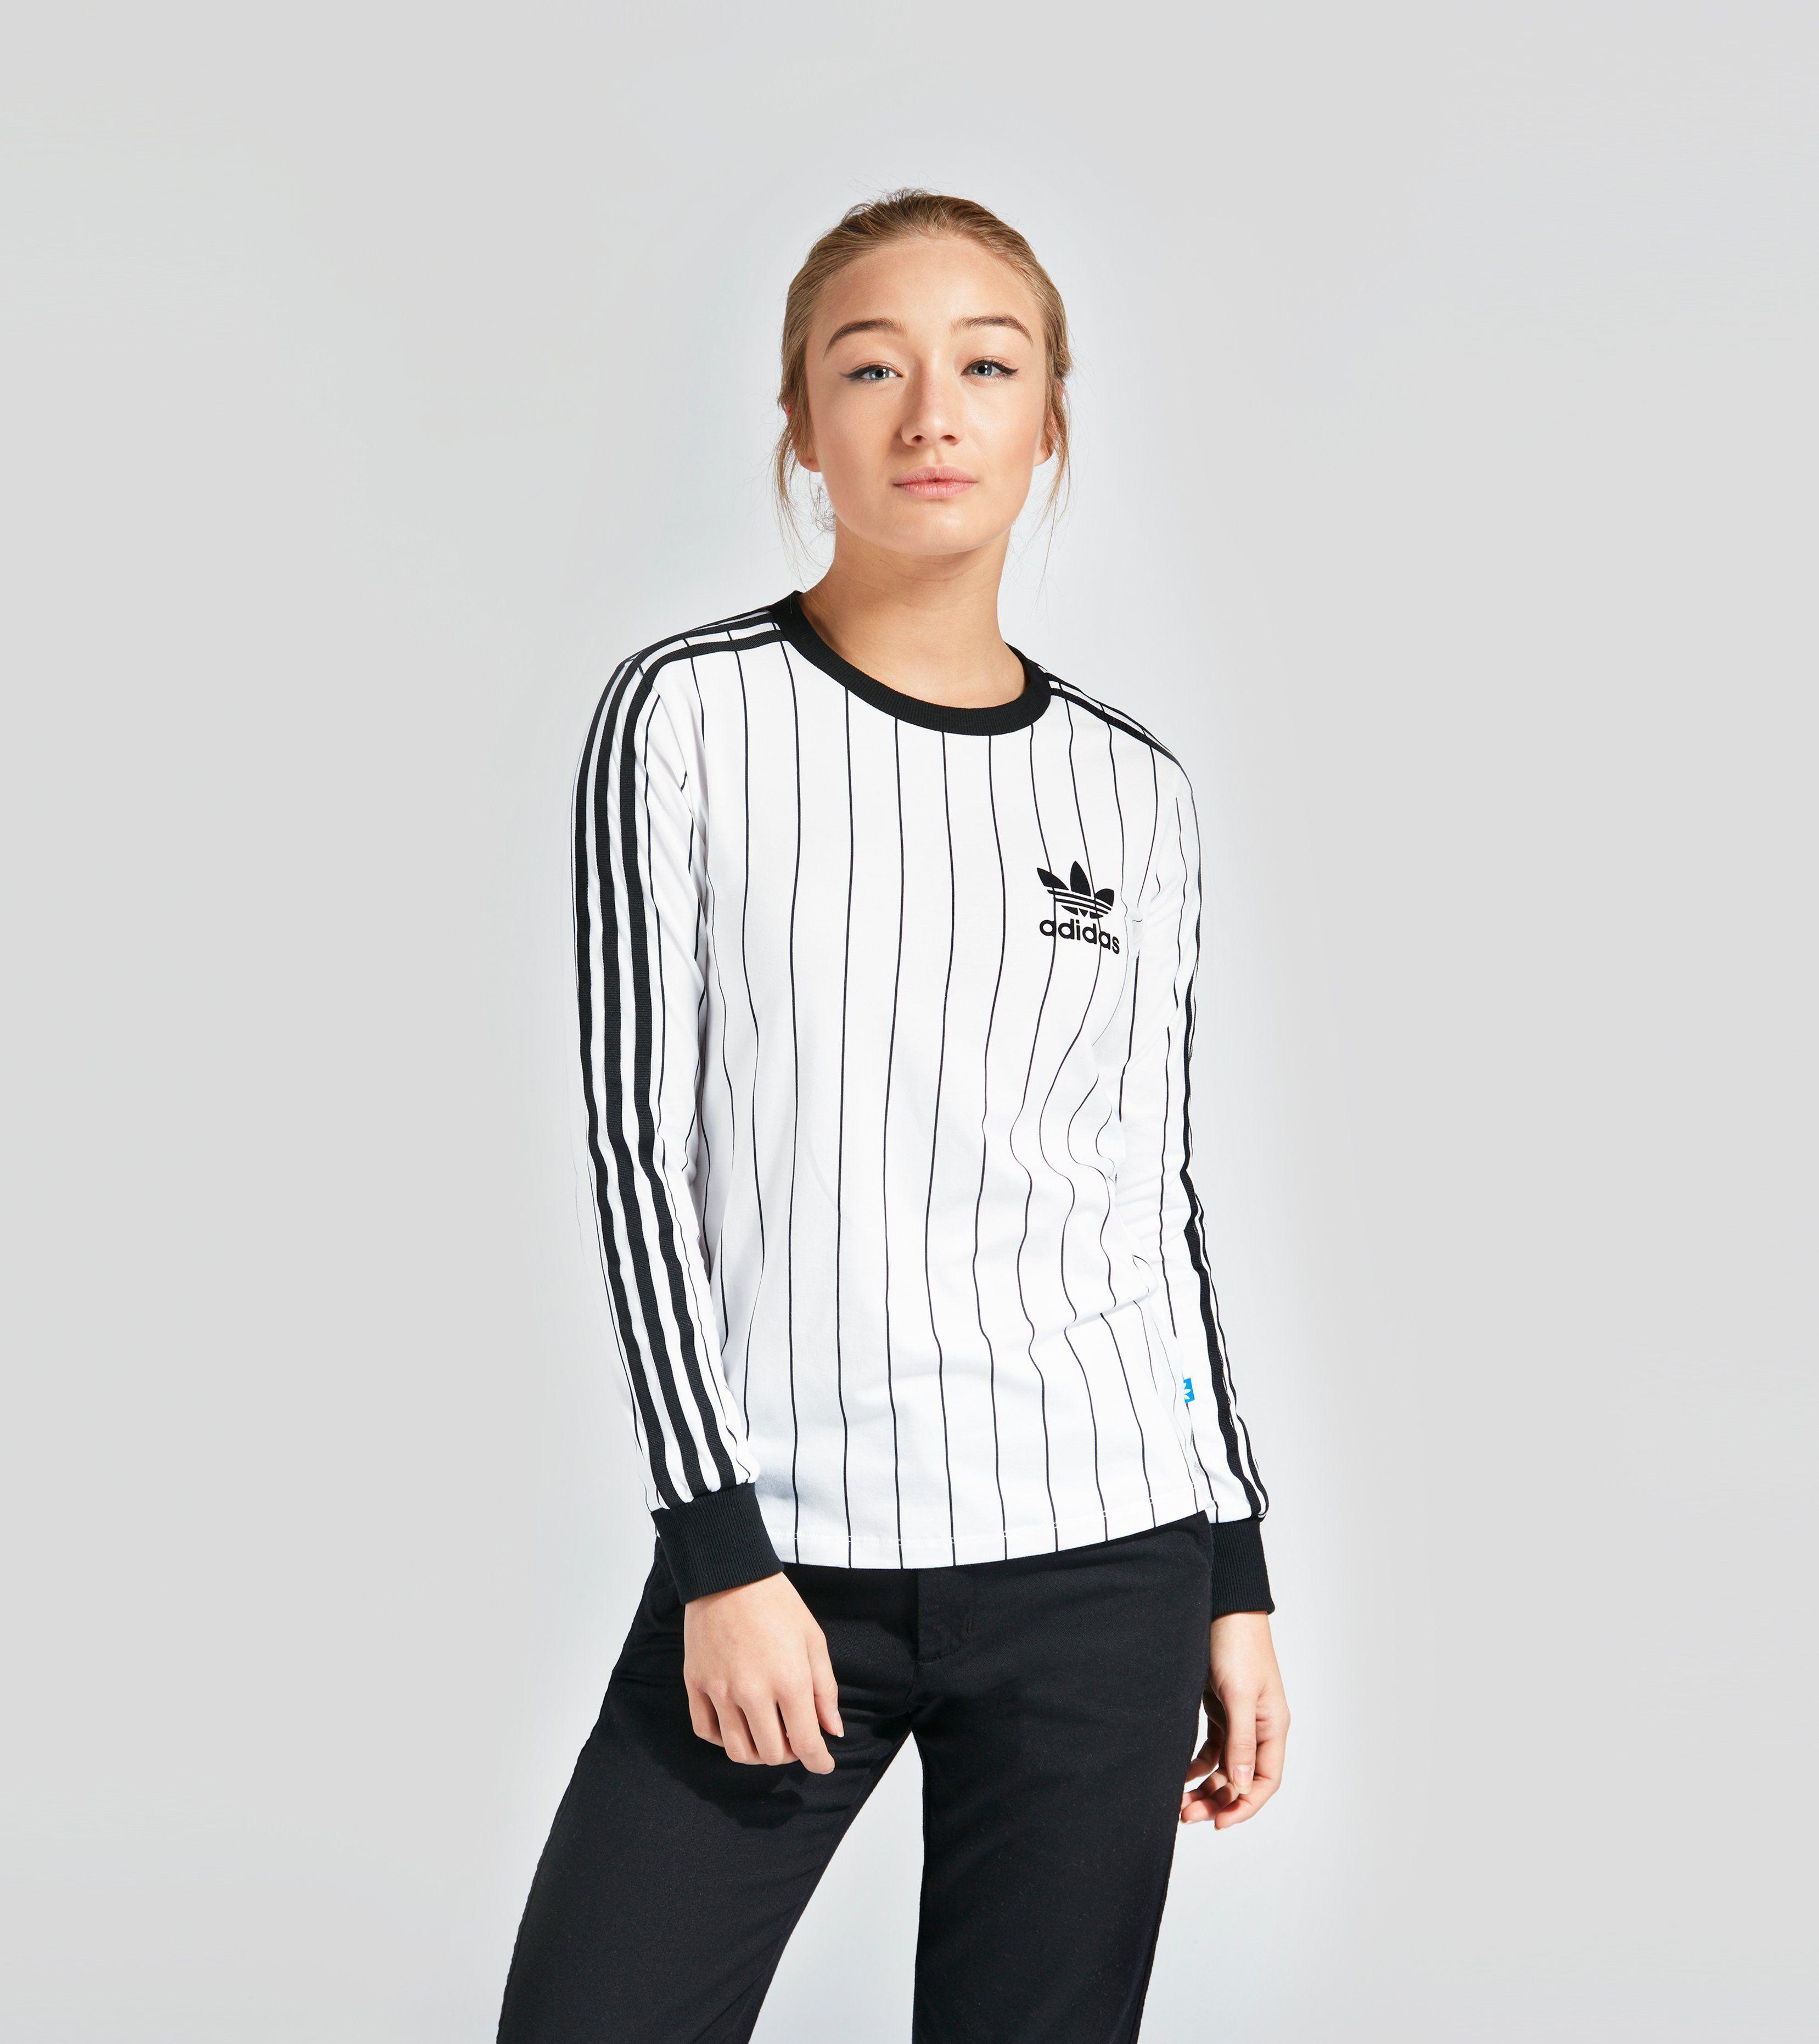 Adidas originals 3 stripe long sleeve t shirt women 39 s size for Women s turquoise long sleeve shirt